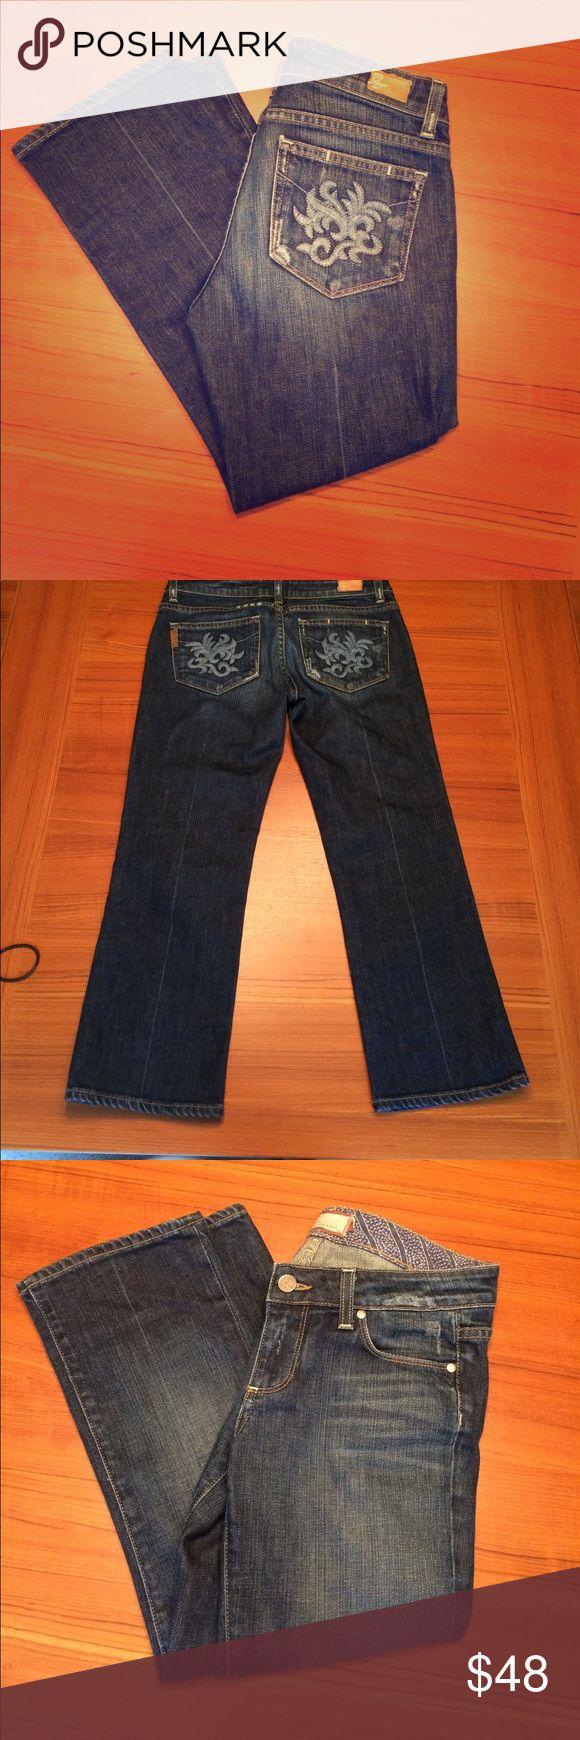 Paige jeans Laurel Canyon size 27 Gorgeous Paige jeans. Laurel Canton style.  Detail on back pockets. Light distress.  Crop. Excellent/ like NEW condition. PAIGE Jeans Ankle & Cropped